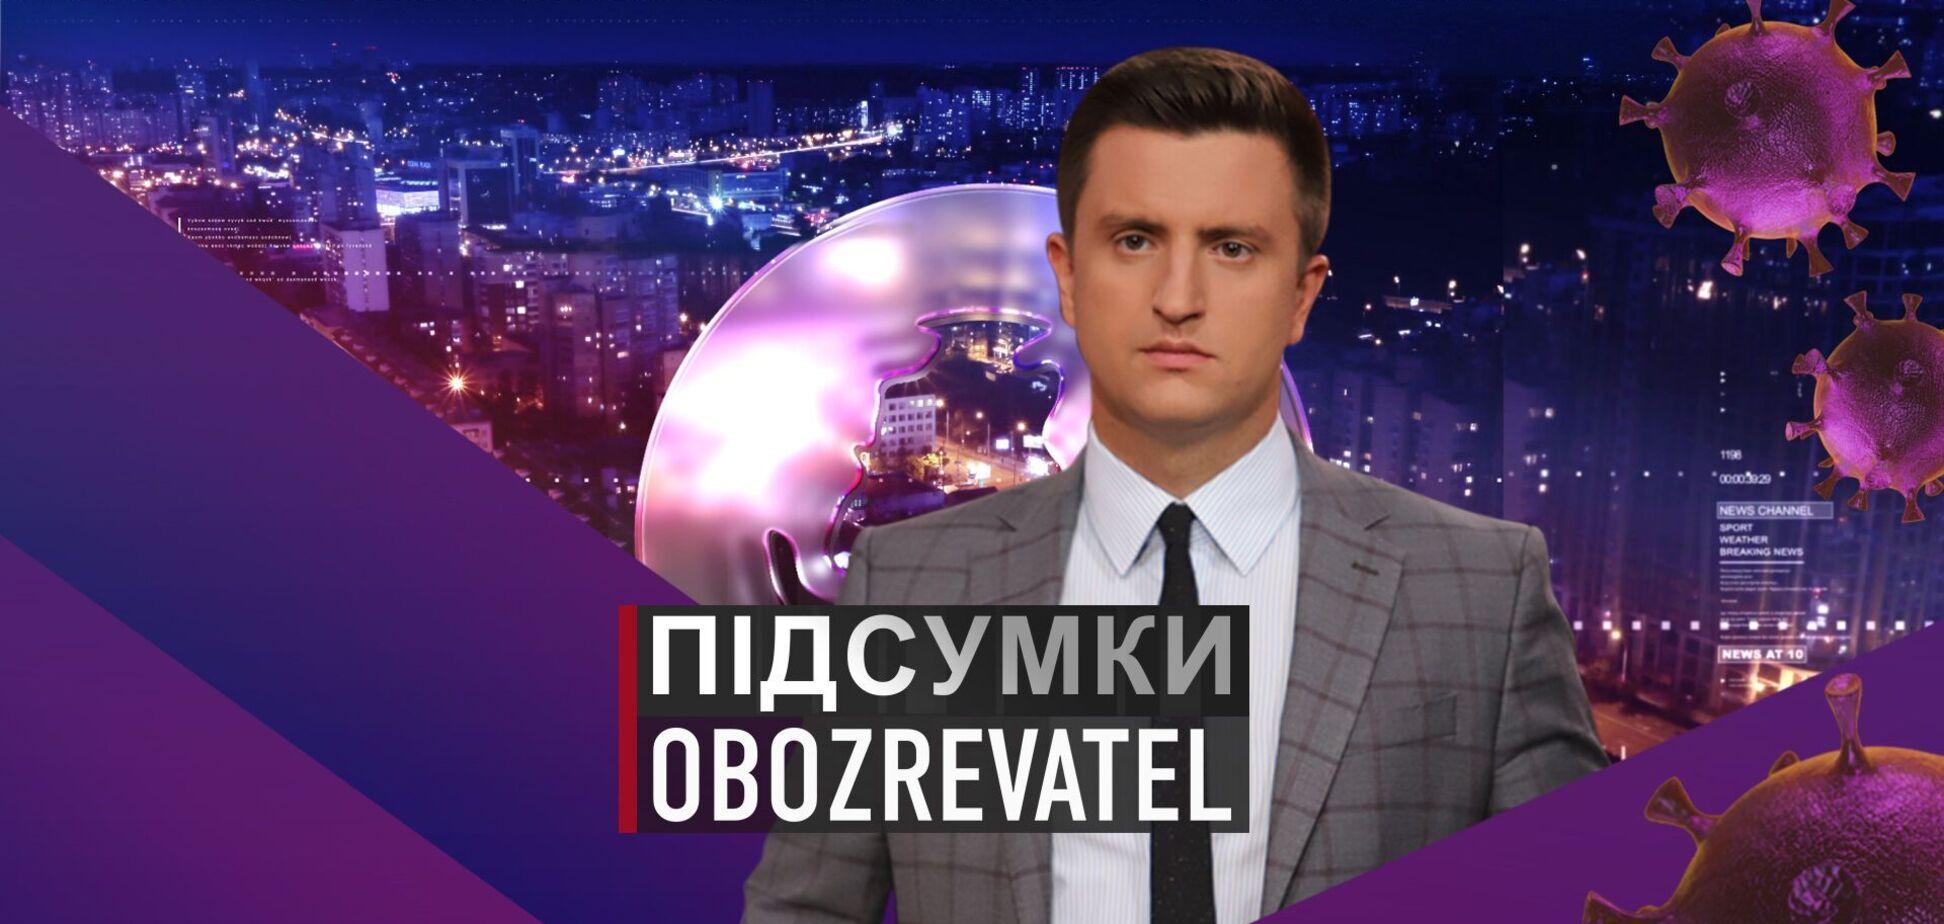 Підсумки с Вадимом Колодийчуком. Понедельник, 1 марта